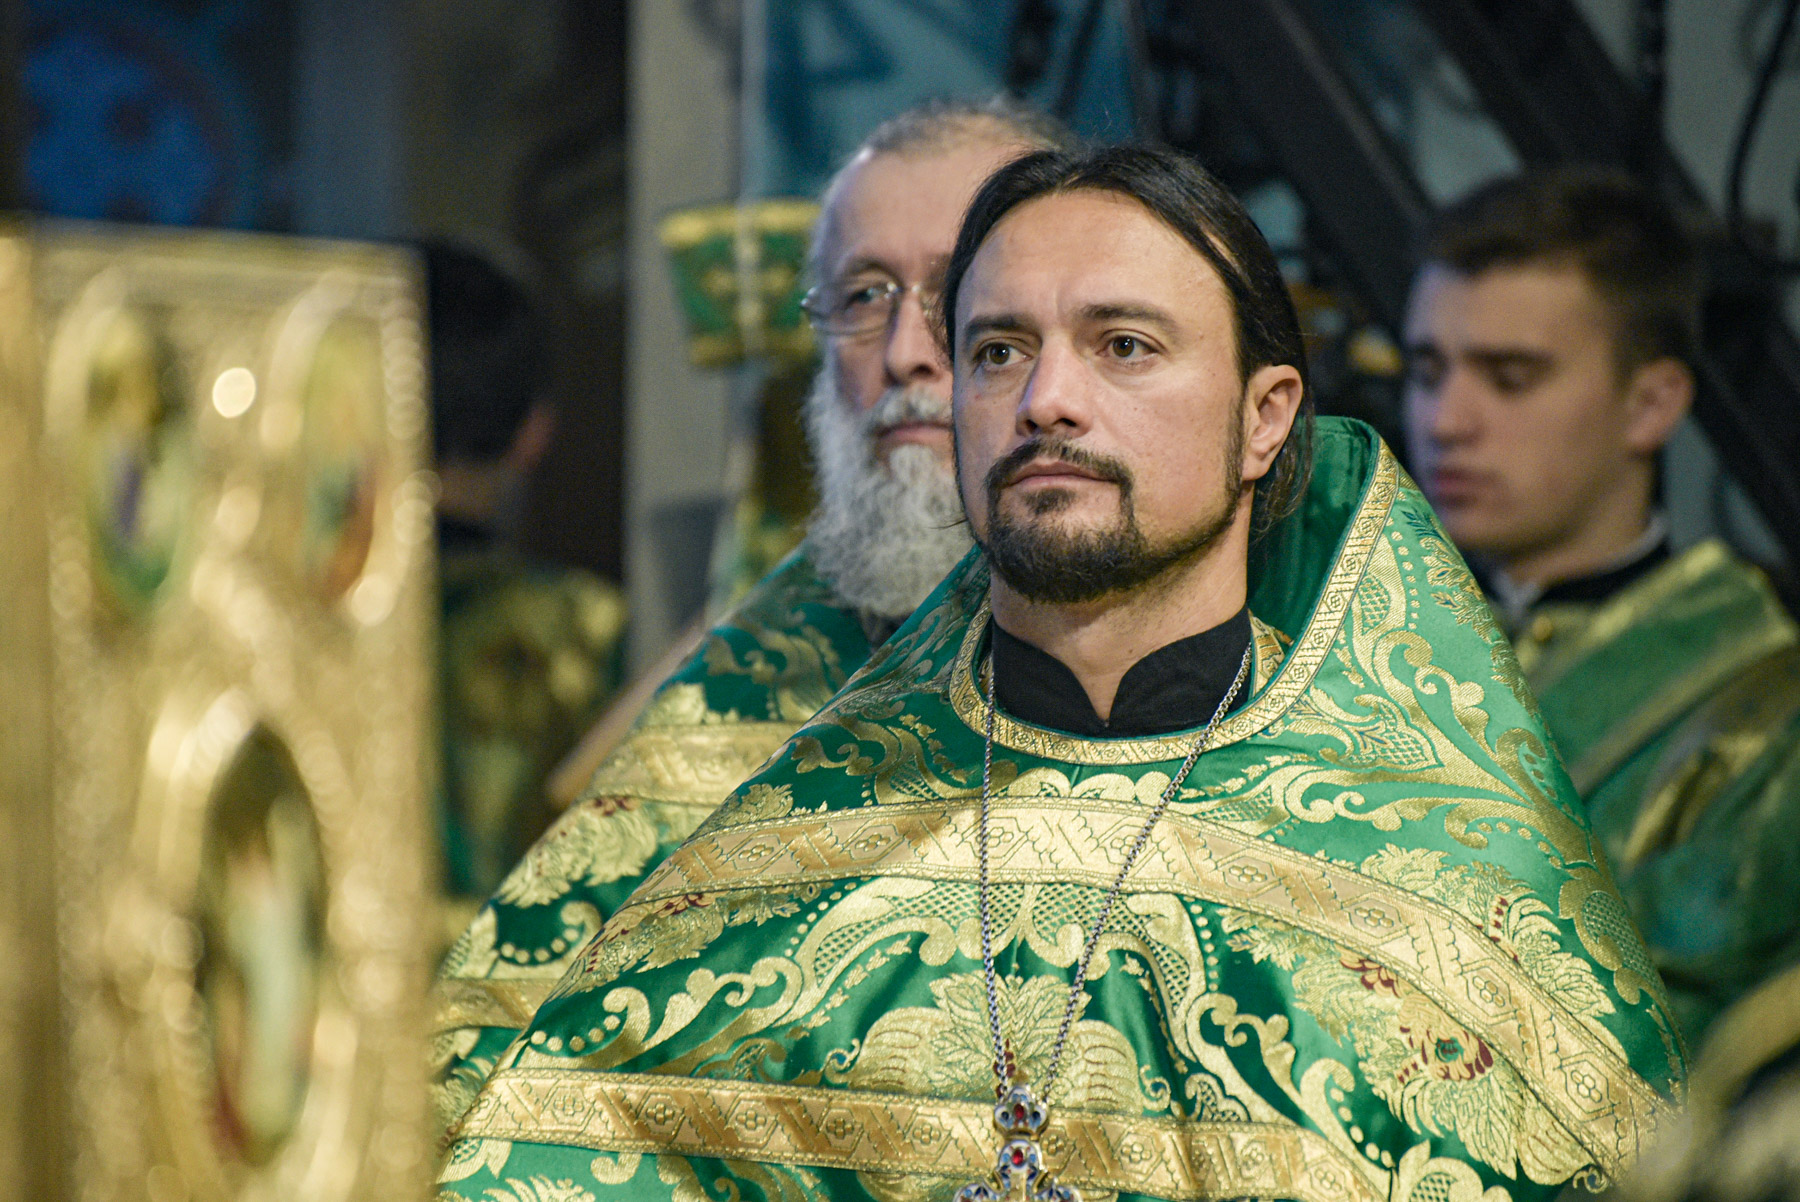 photos of orthodox christmas 0182 2